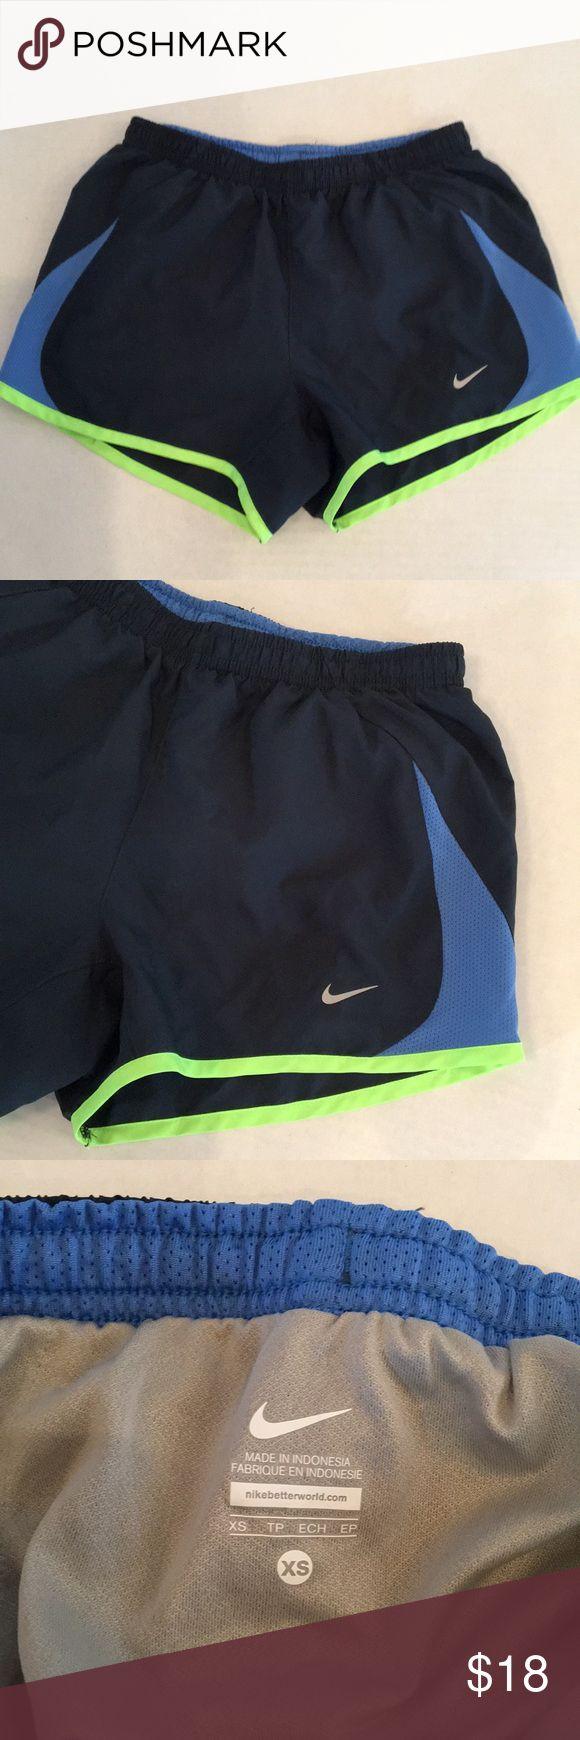 Nike Tempo Shorts Like new! Nike Tempo Shorts. Inner liner with drawstring. Size extra small. Nike Shorts